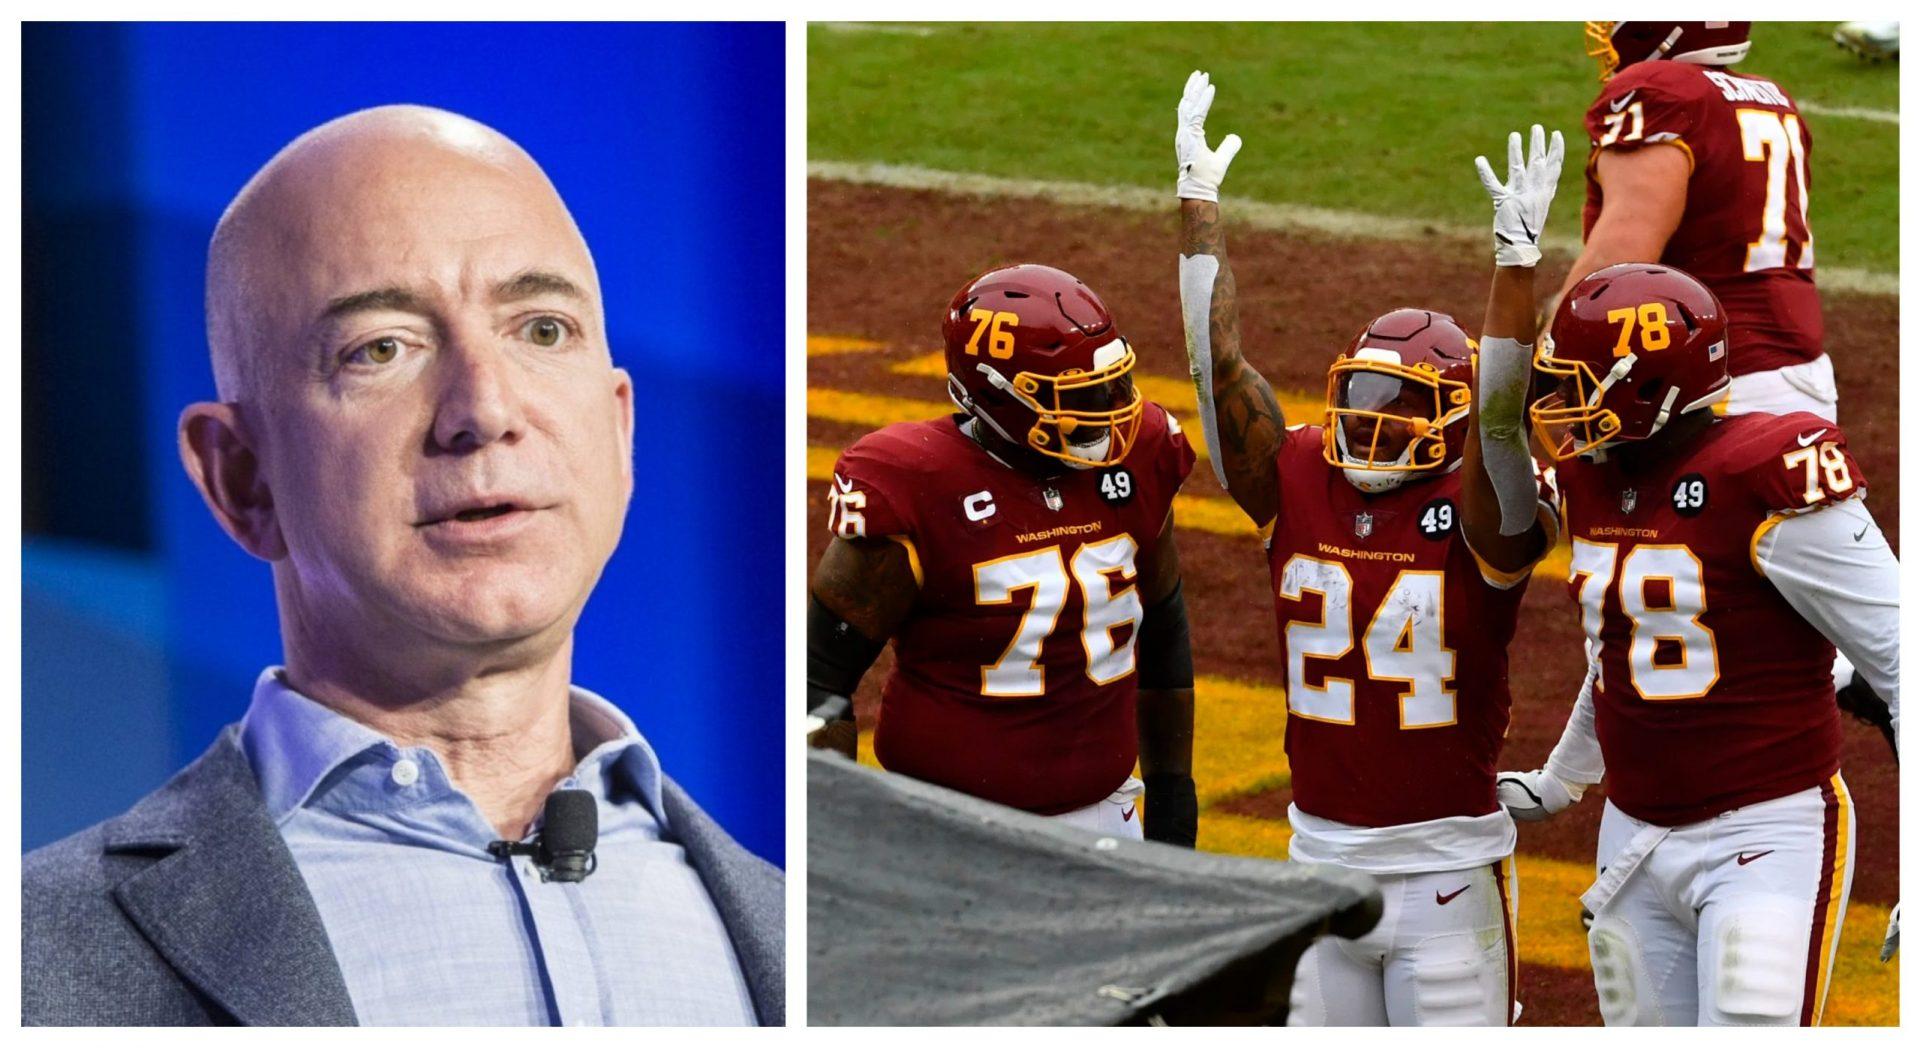 Amazon CEO Jeff Bezos reportedly eyeing Washington Football Team ownership - THE SPORTS ROOM